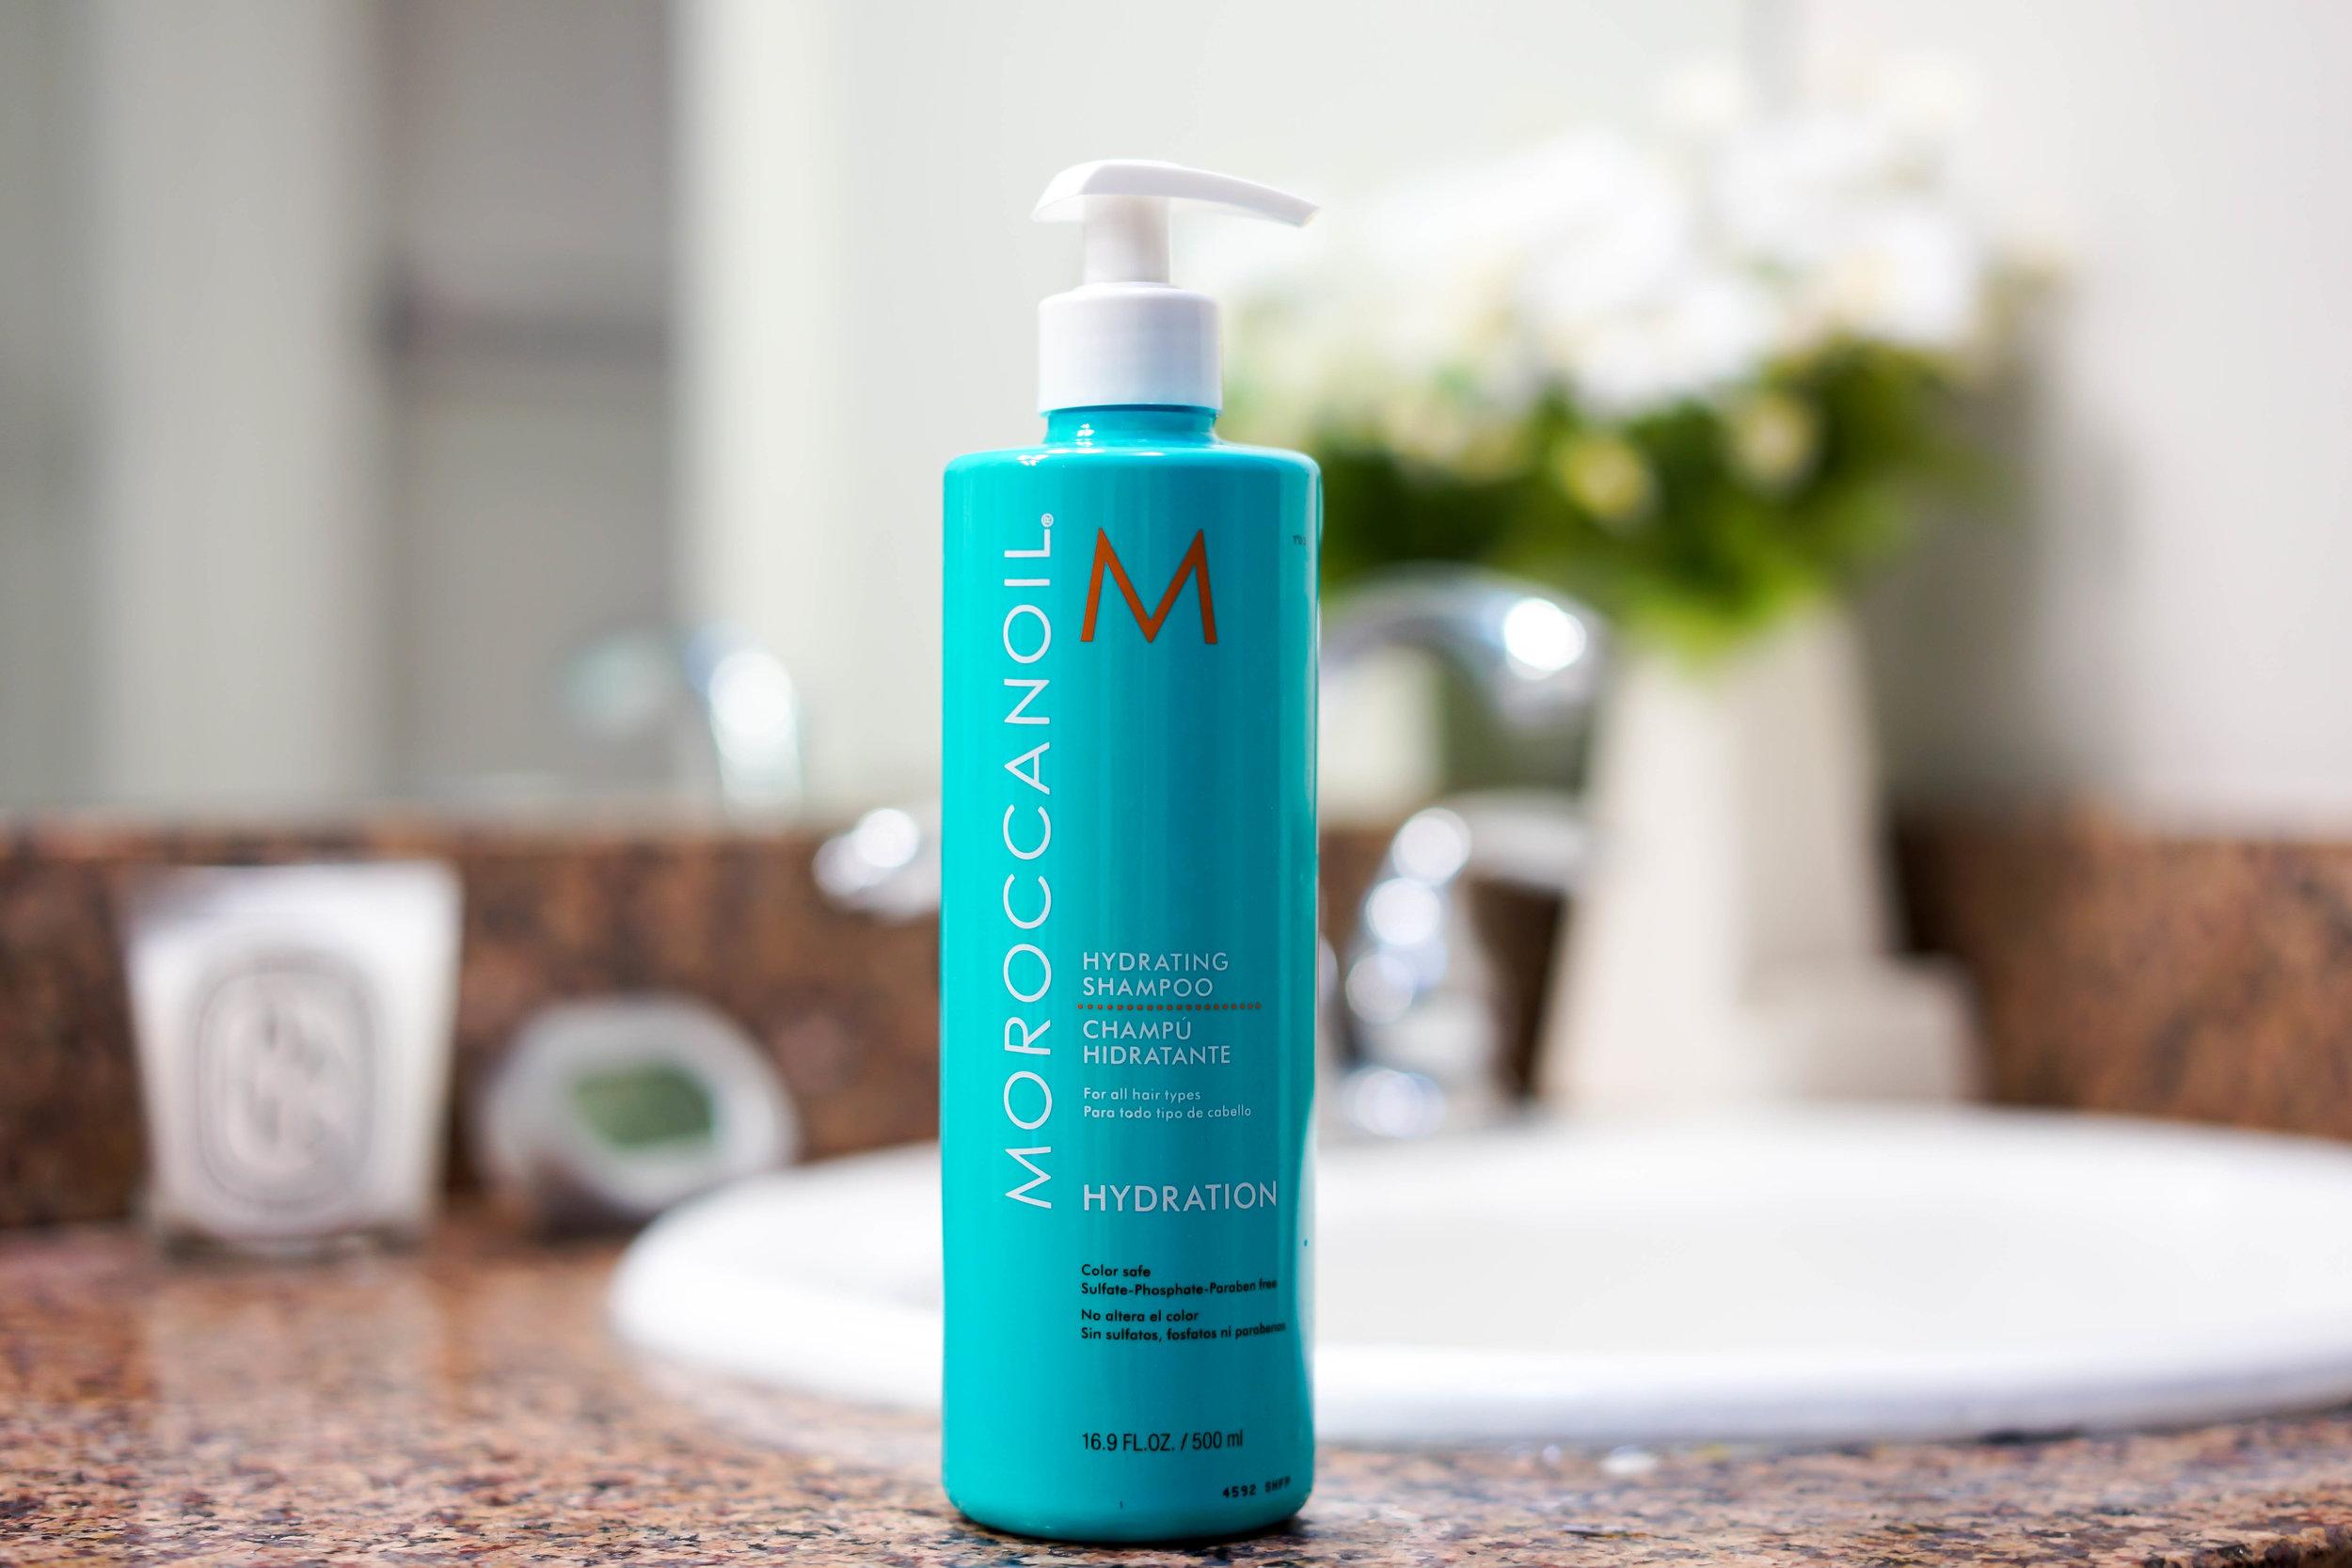 Moroccanoil Hydration Shampoo